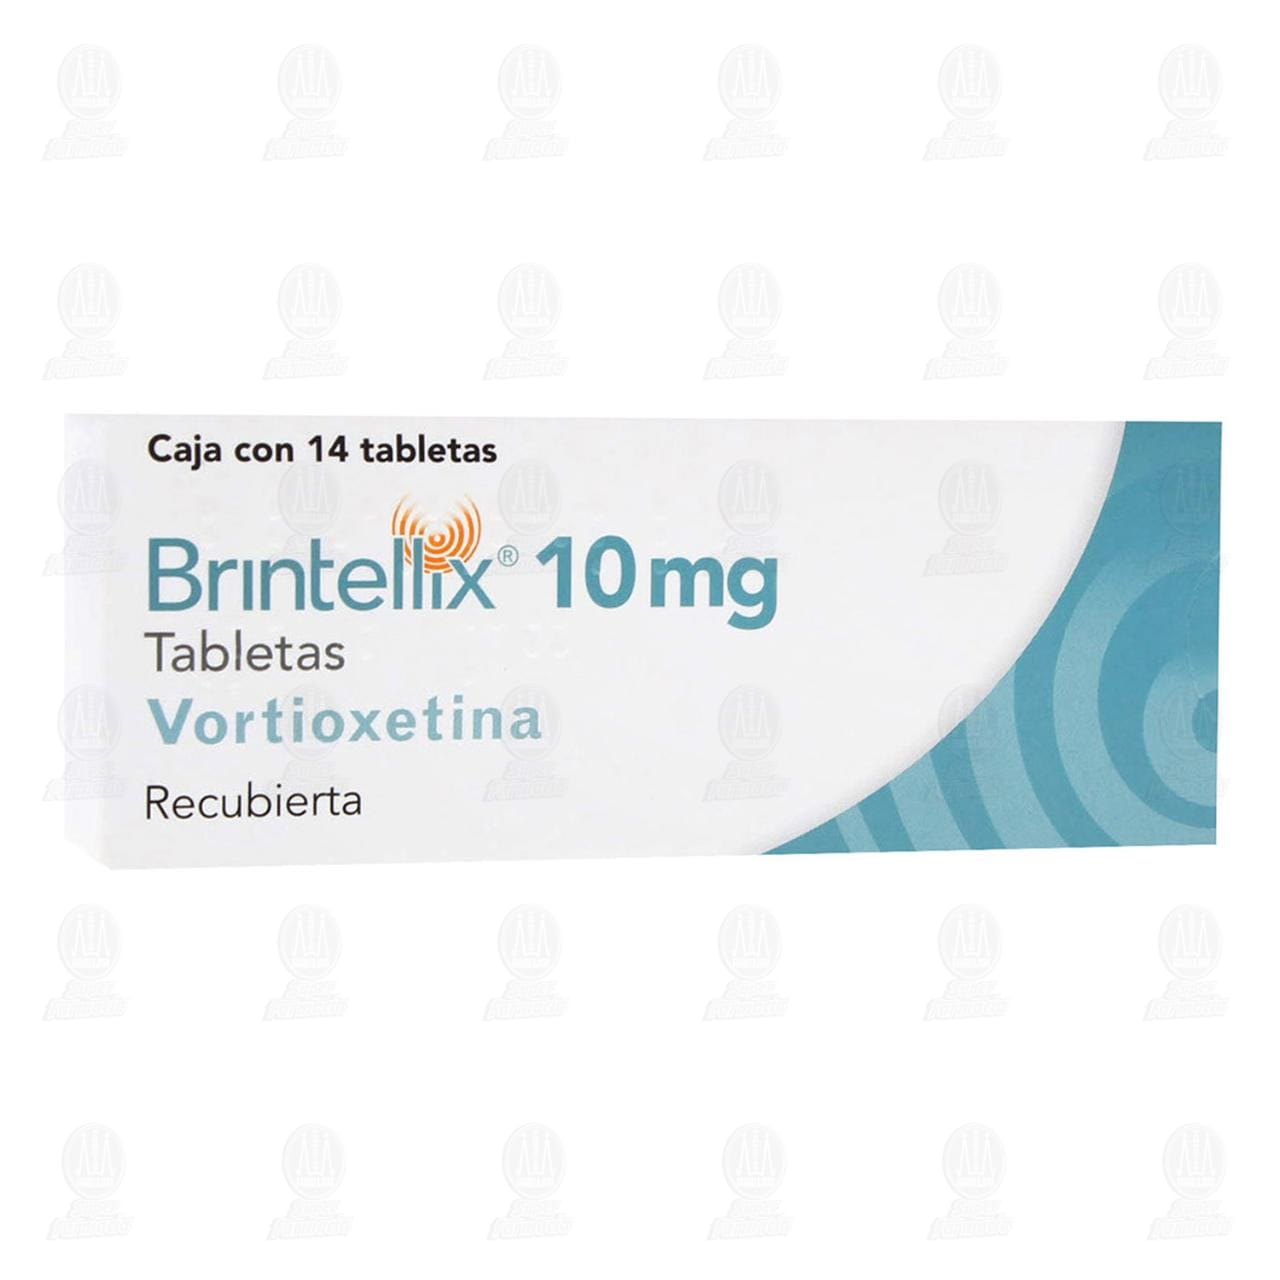 Brintellix 10mg 14 Tabletas